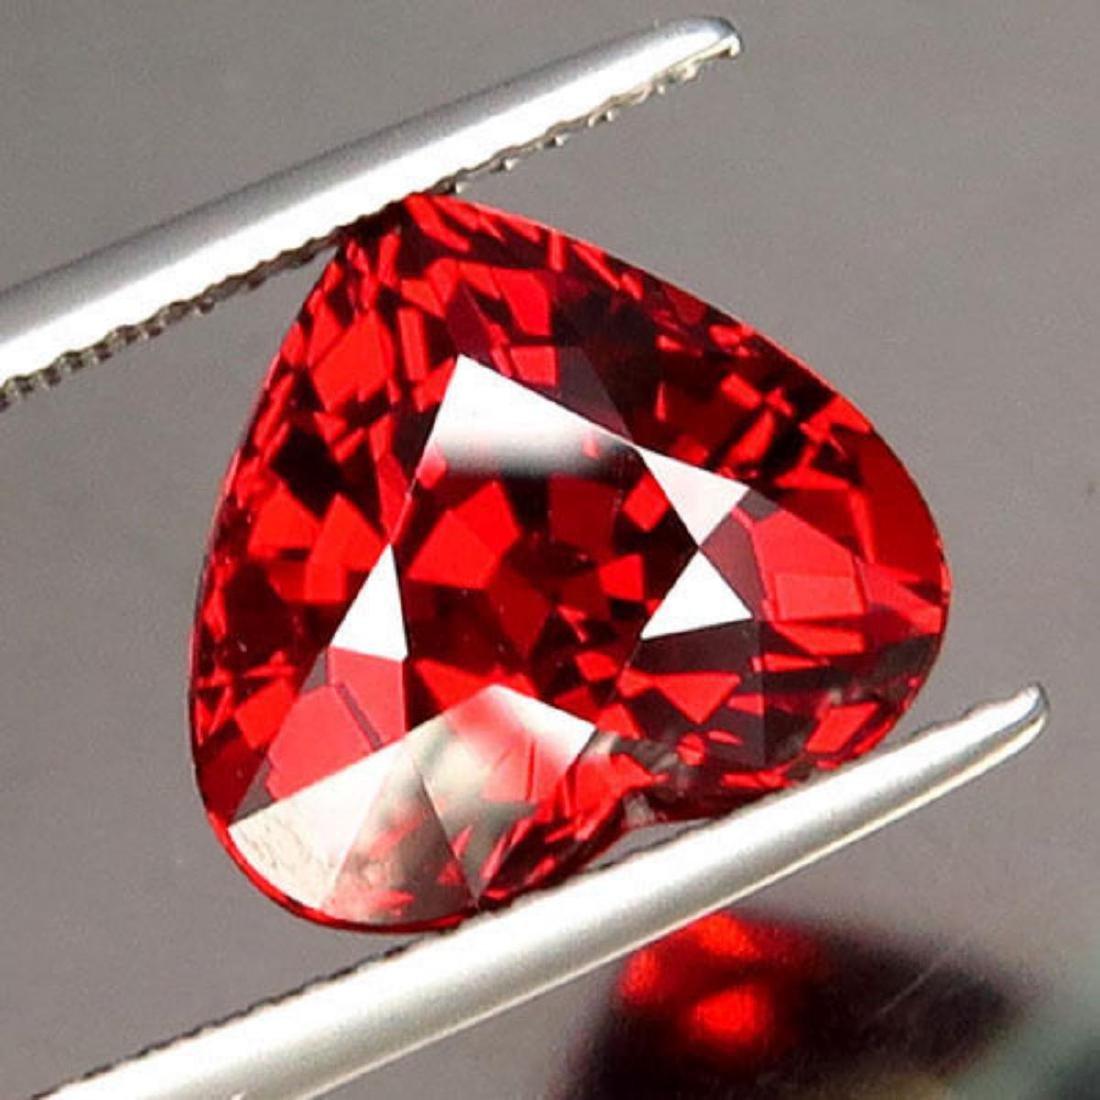 Natural Heart Shape Spessartite 7.38 ct - VVS